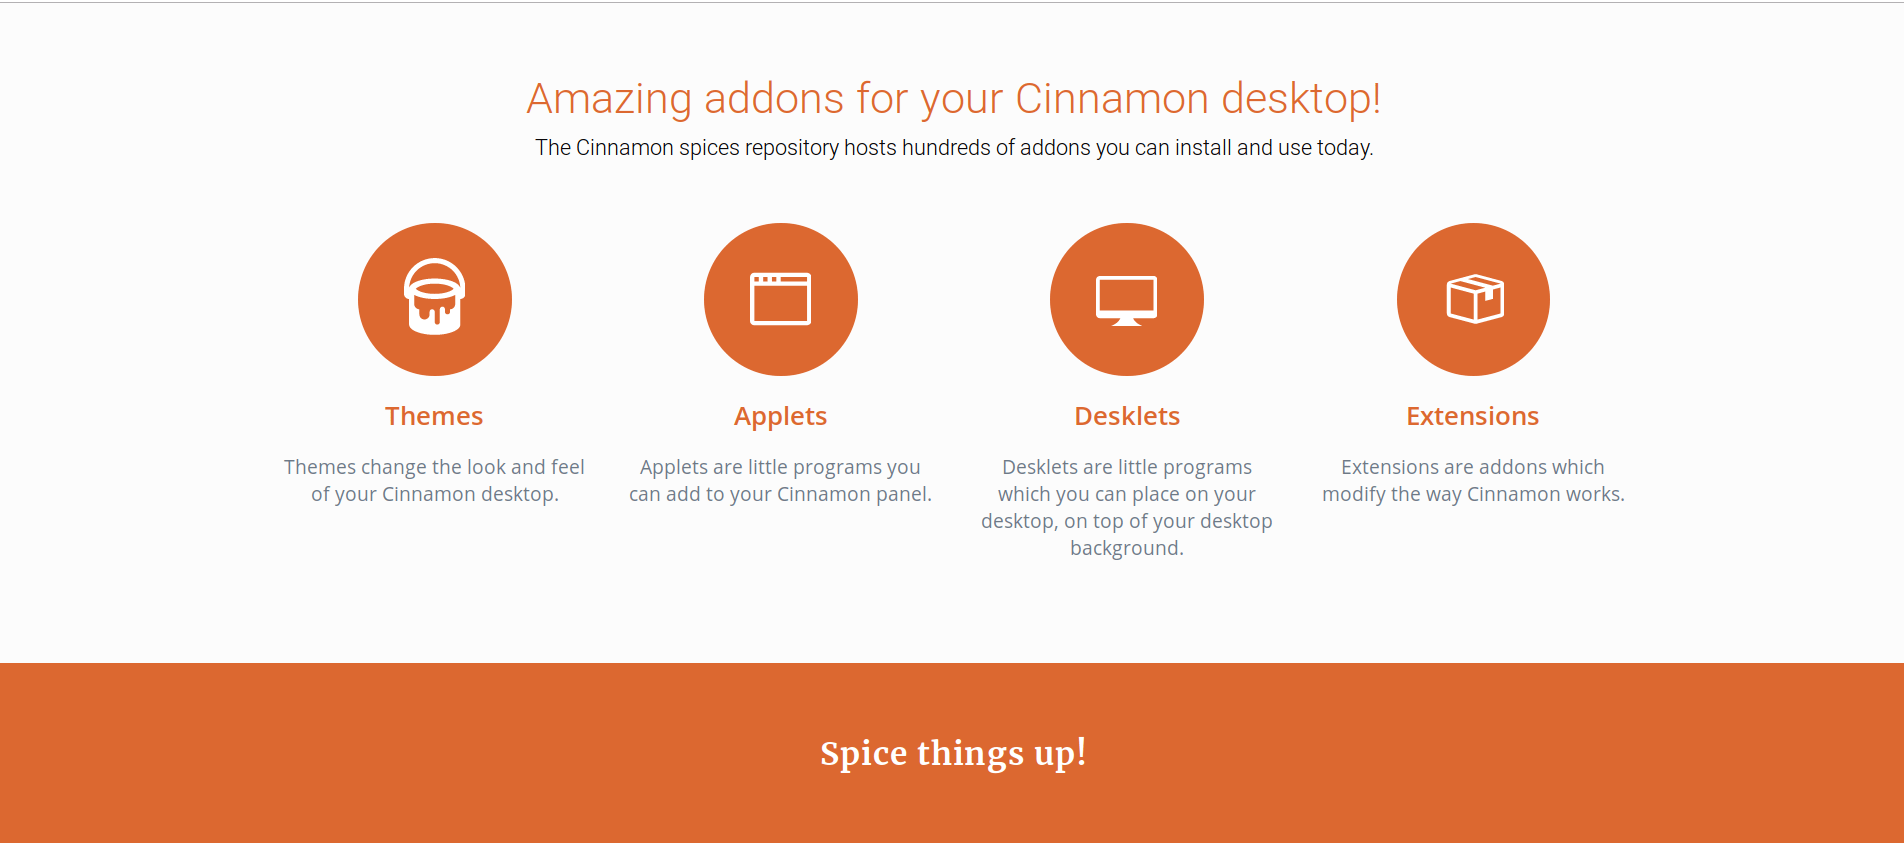 A Dive Inside Cinnamon, an Overlooked Linux Desktop 41